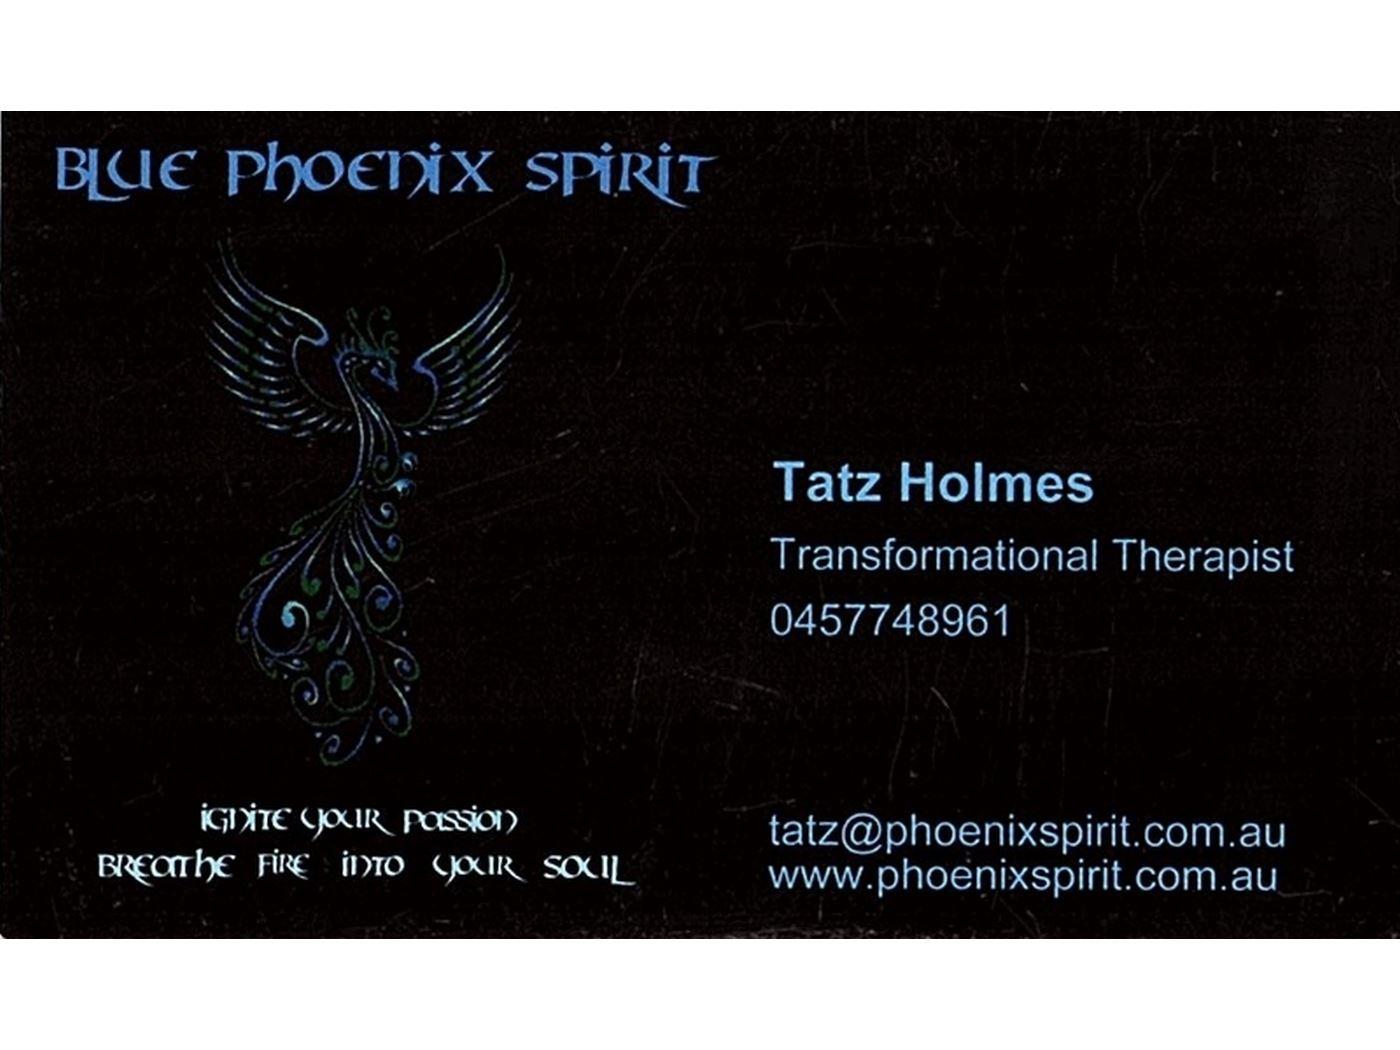 Blue Pheonix Spirit